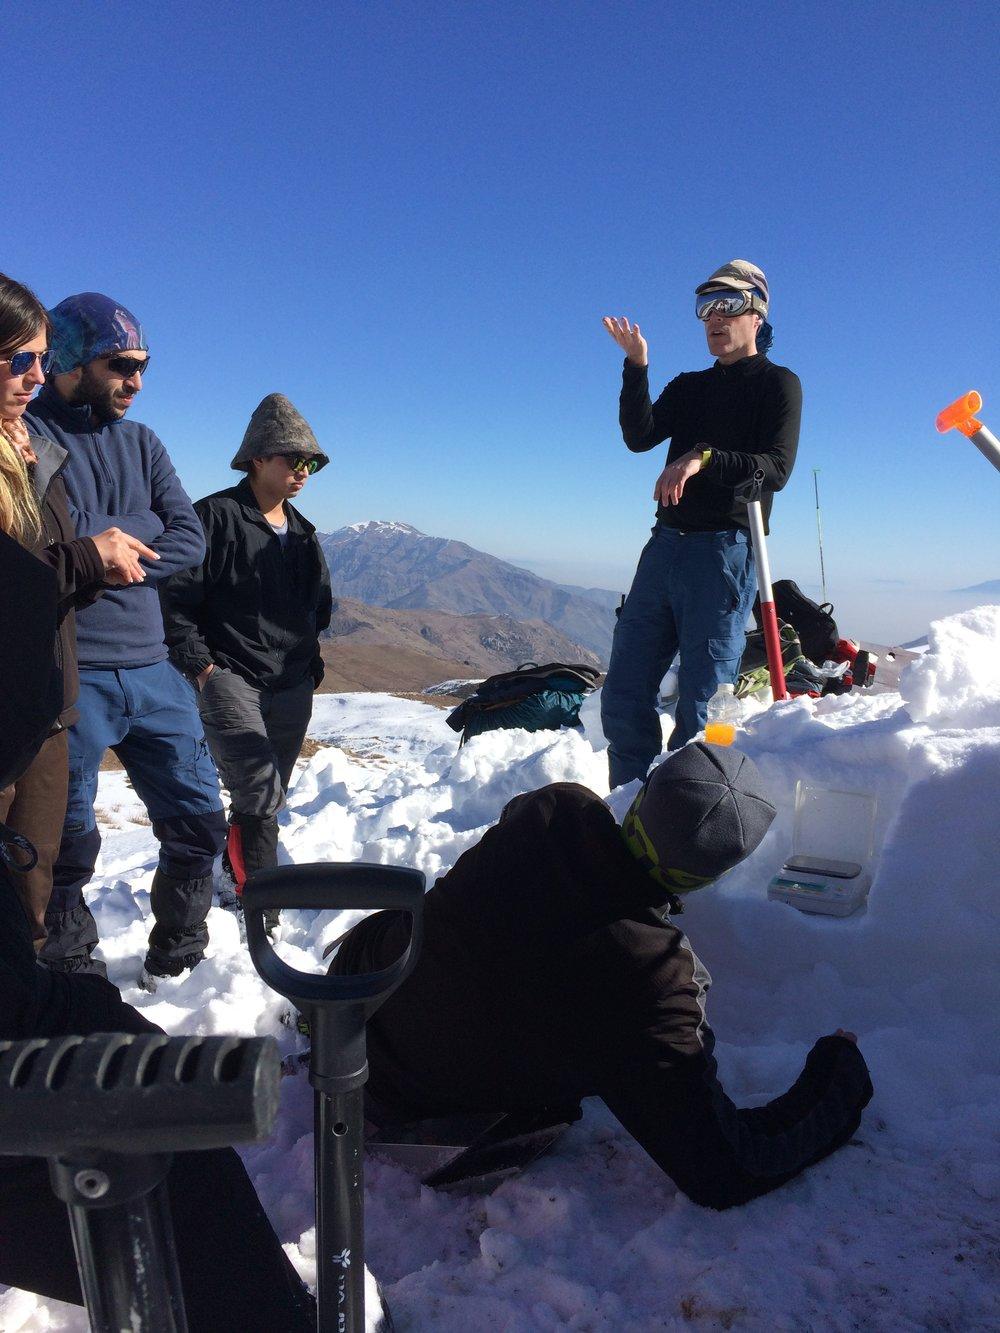 Prof. James McPhee, Universidad de Chile, explains density changes in the snowpack